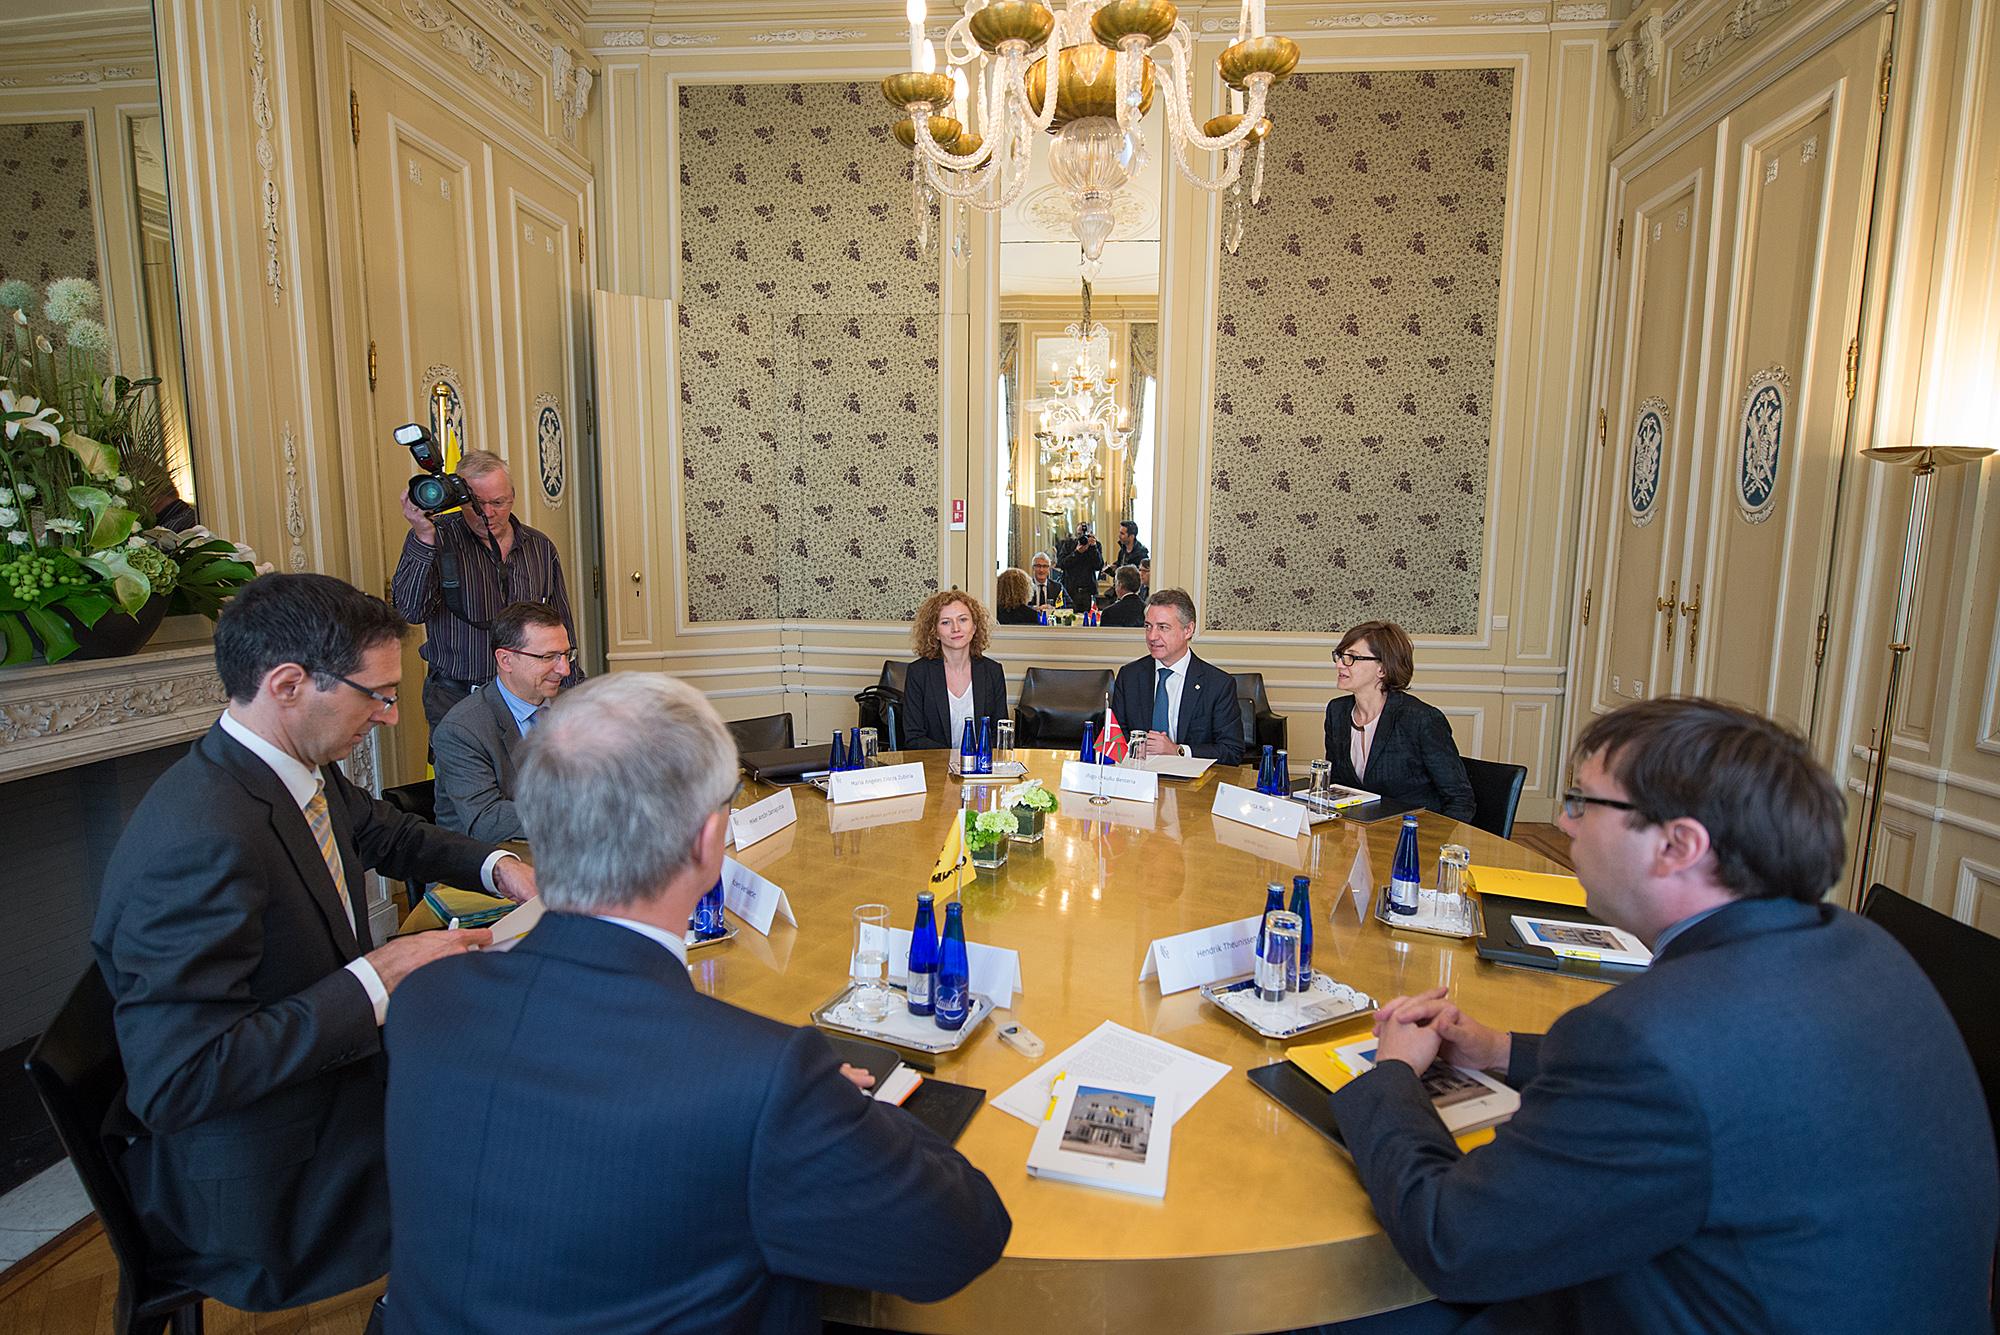 2015_06_01_lhk_flandes_gobierno_135.jpg